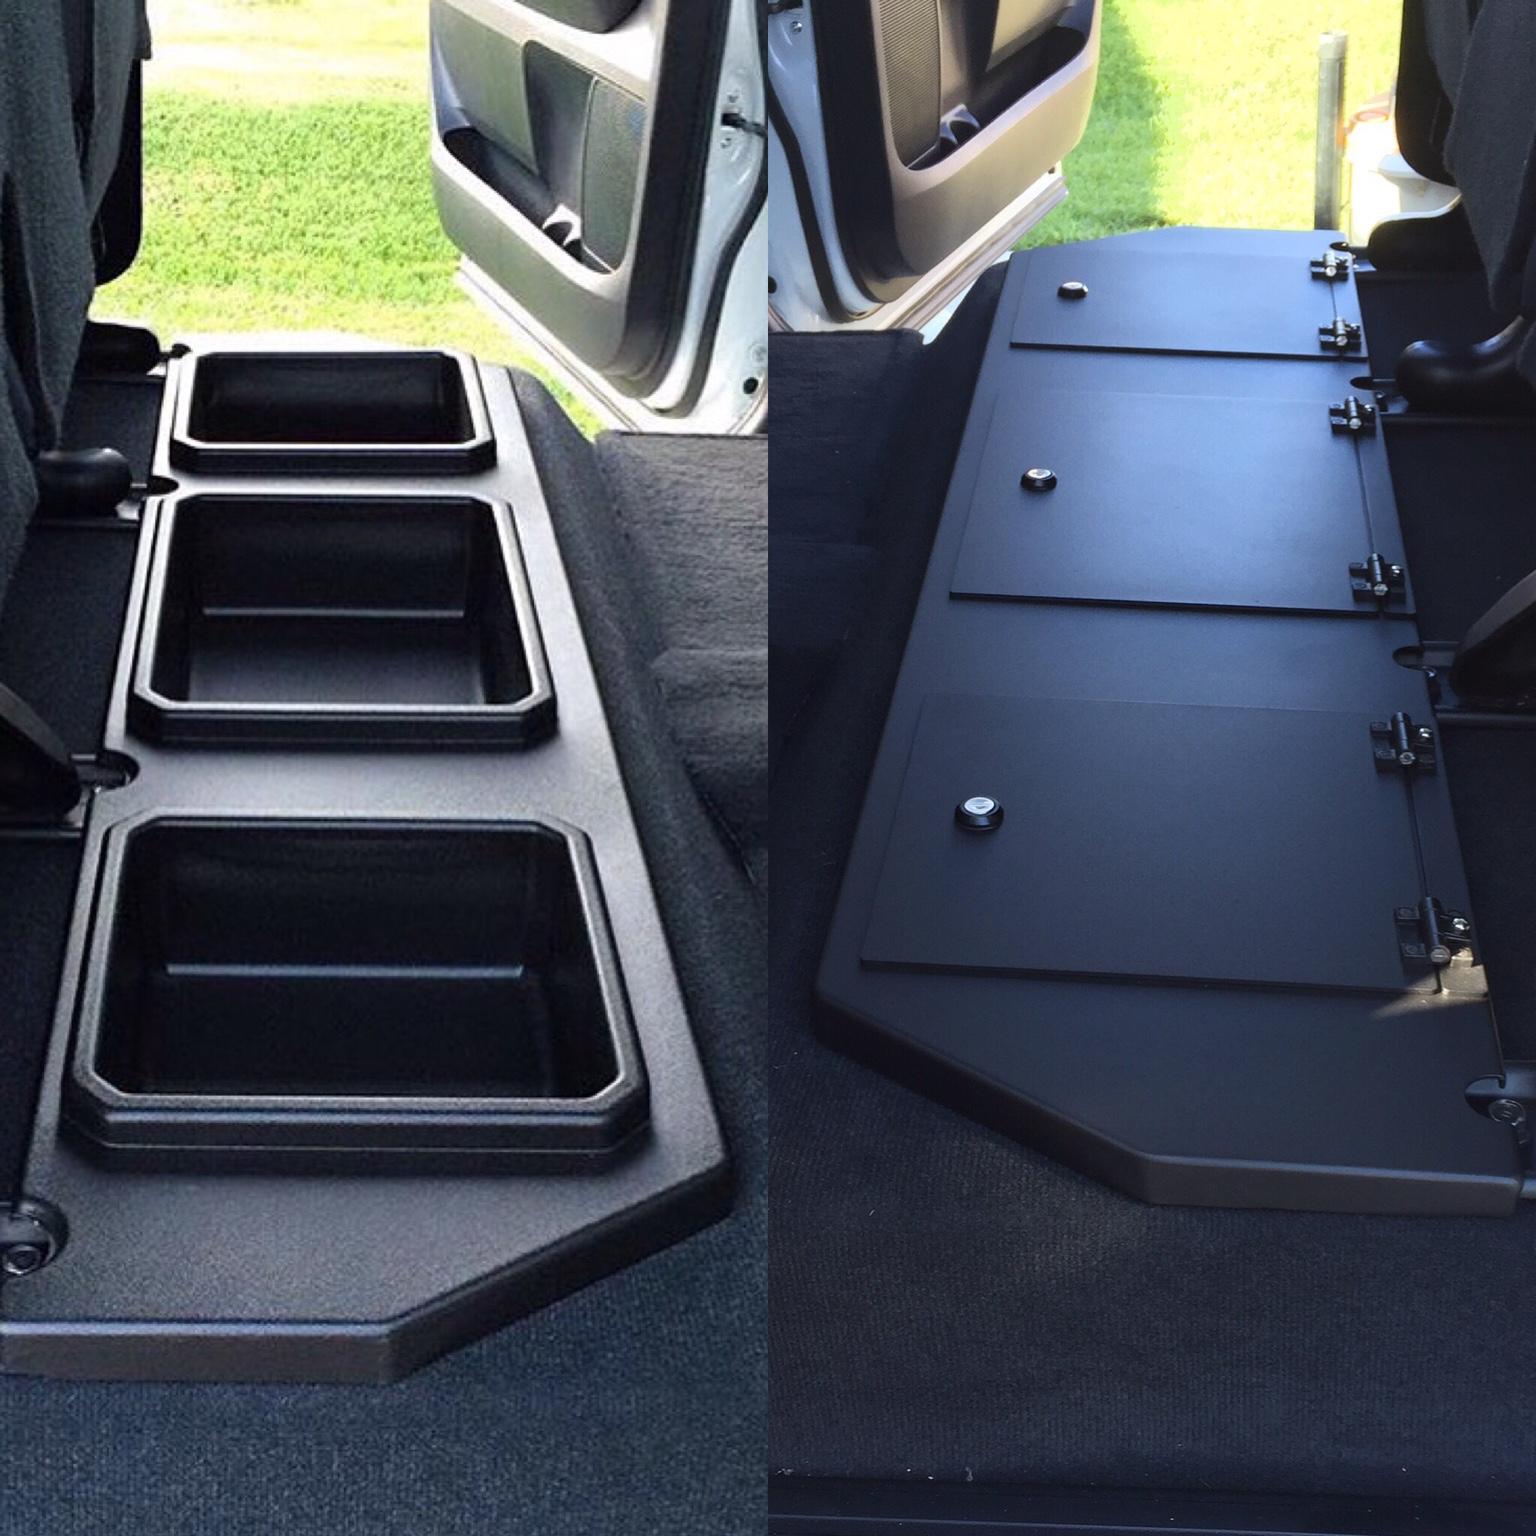 Toyota Tundra Seat Covers >> ESP Truck Accessories Labor Day Sale - TundraTalk.net - Toyota Tundra Discussion Forum